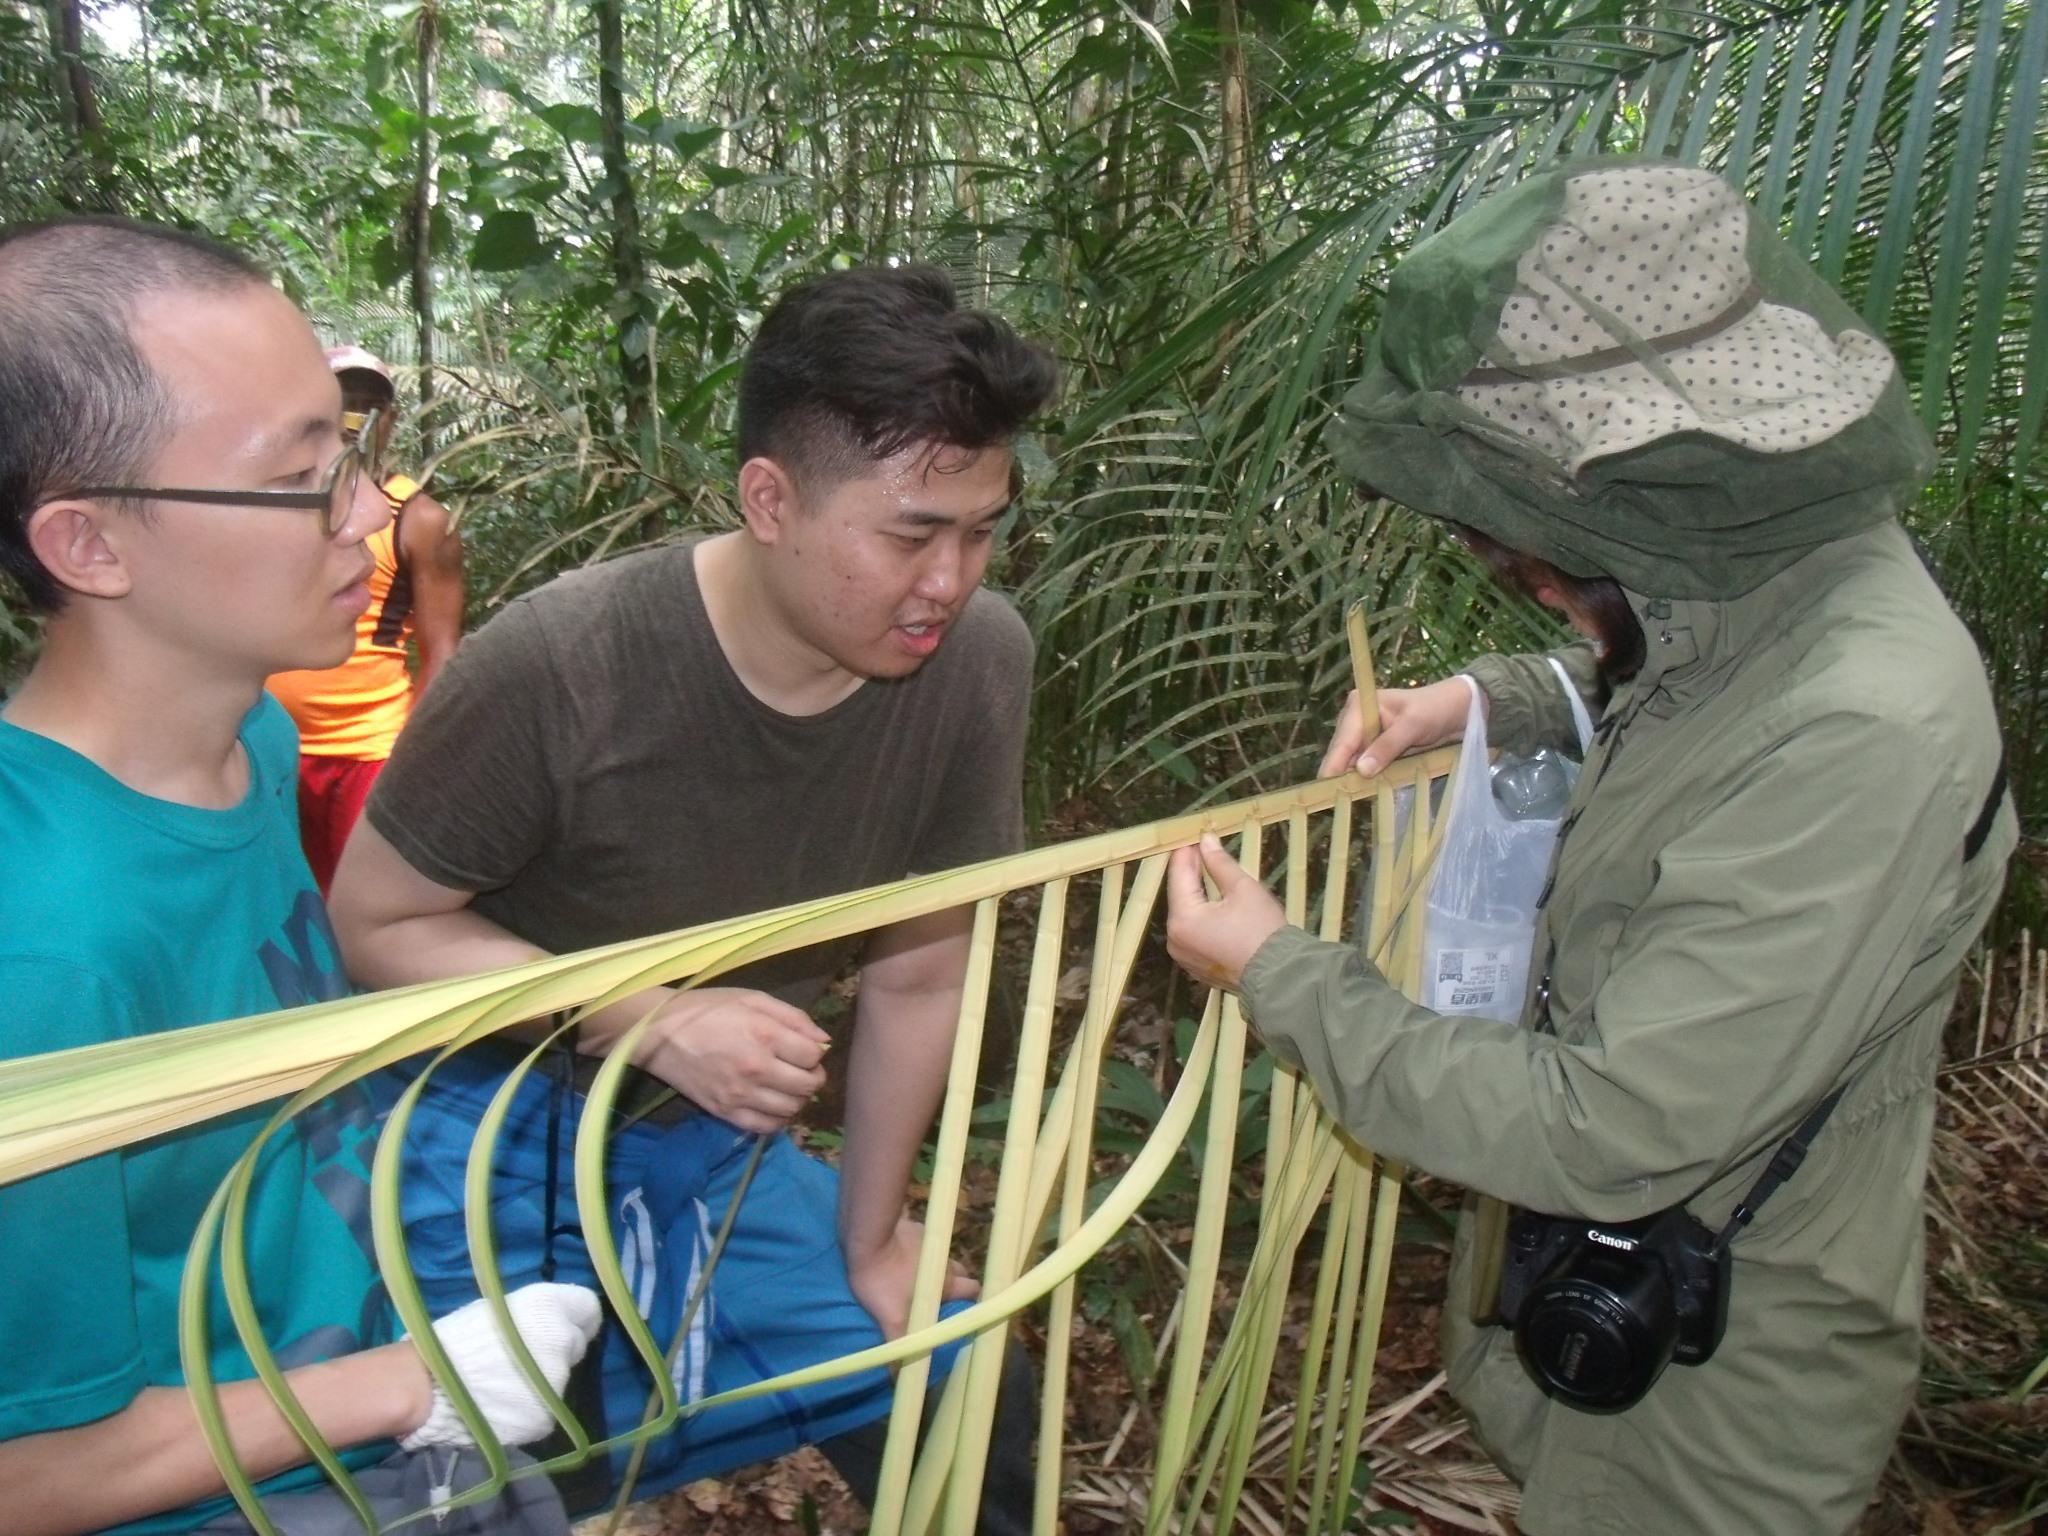 Weaving Palm leaves